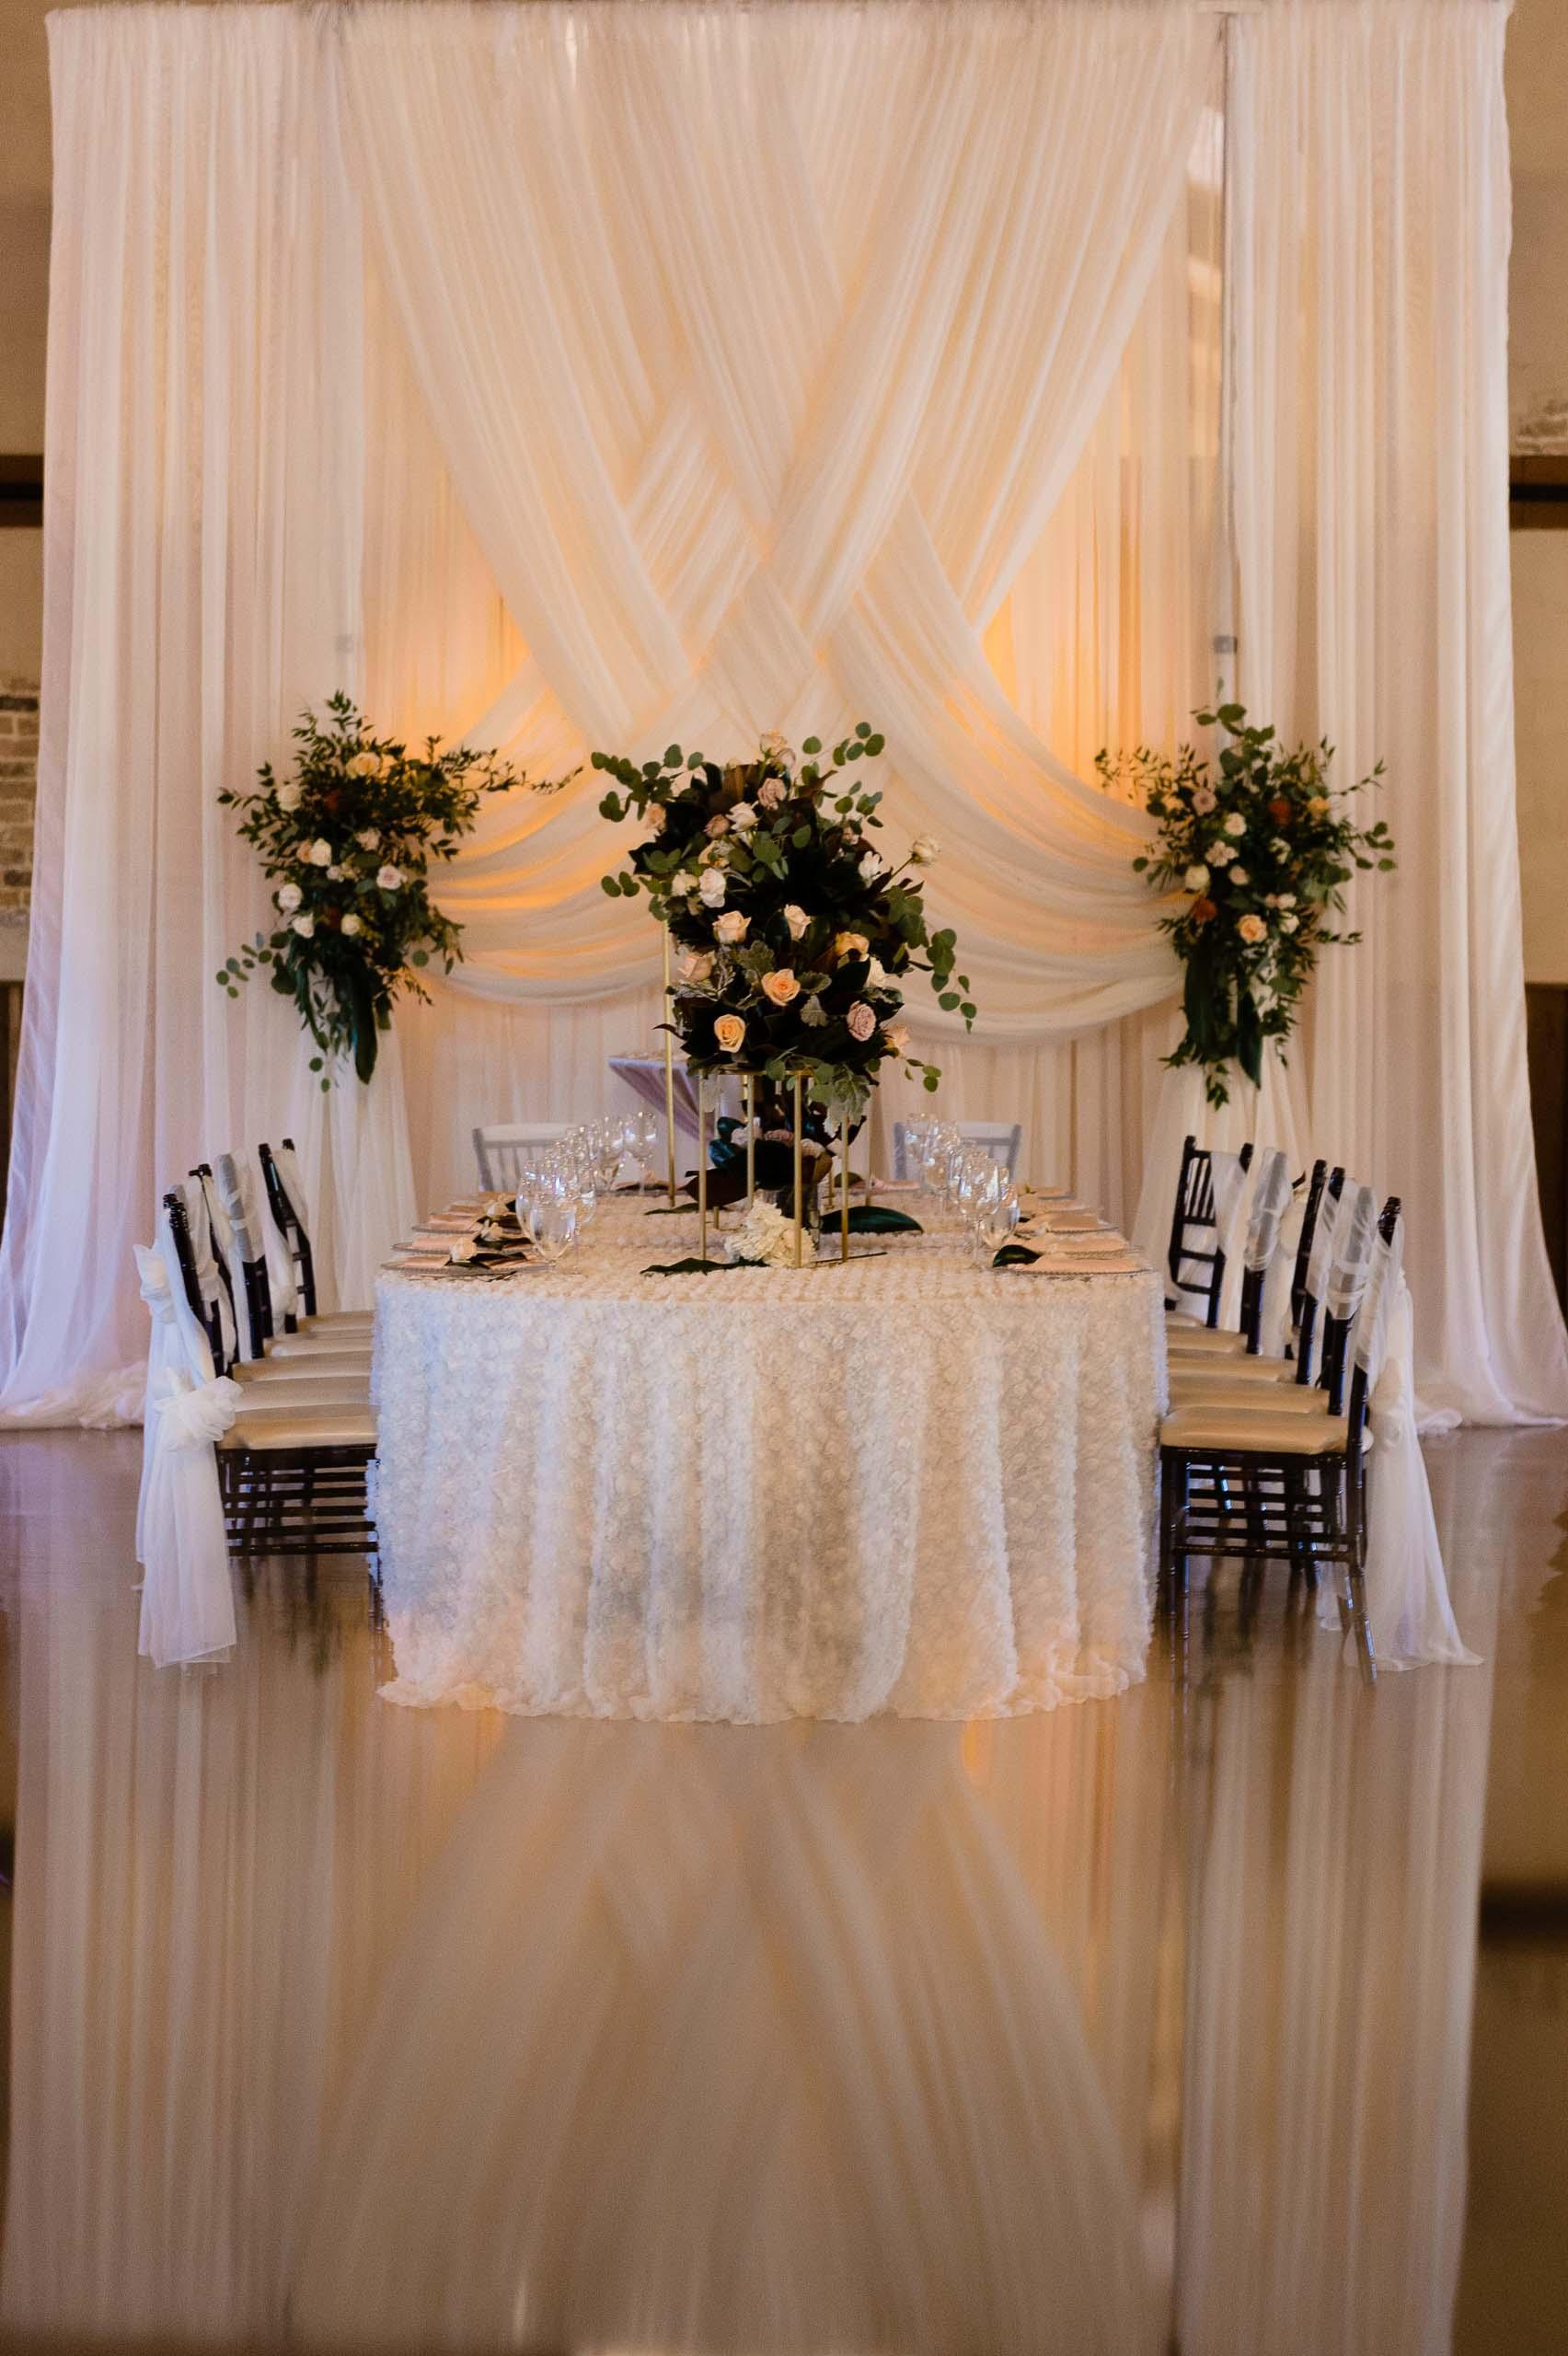 chandelier-of-gruene-winter-wedding-inspiration-_4S28008